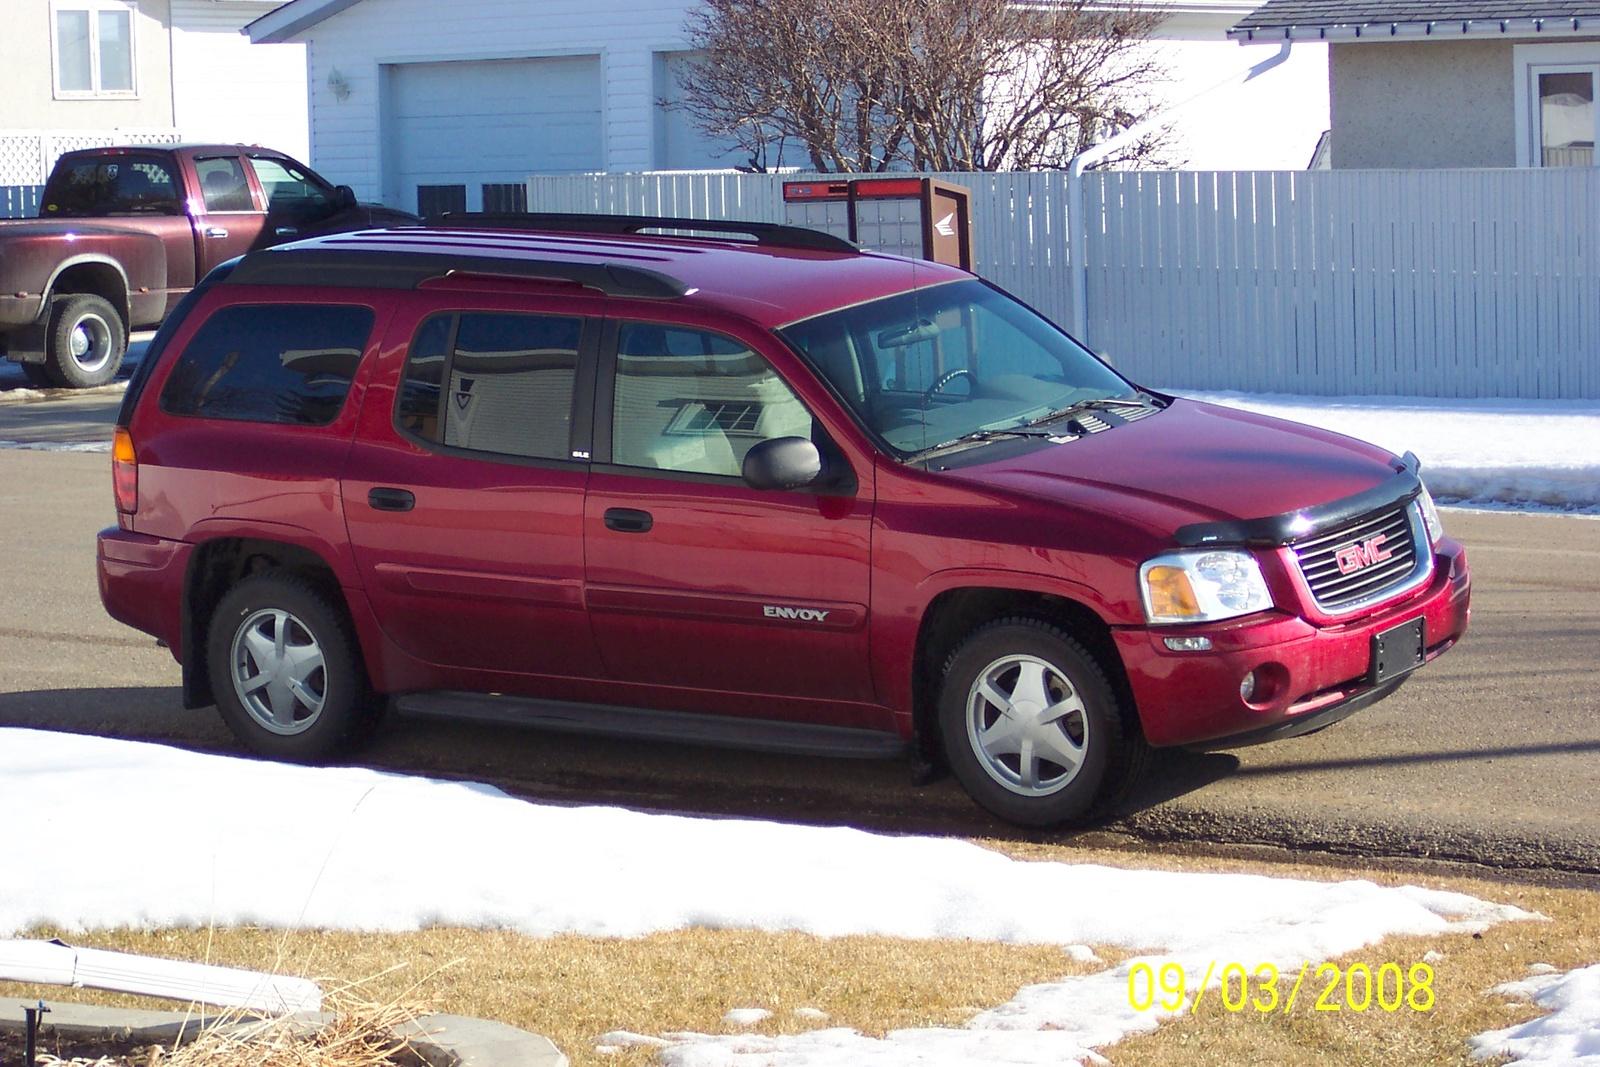 2005 GMC Envoy XL SLE 4WD - Pictures - 2005 GMC Envoy XL SLE 4WD pict ...